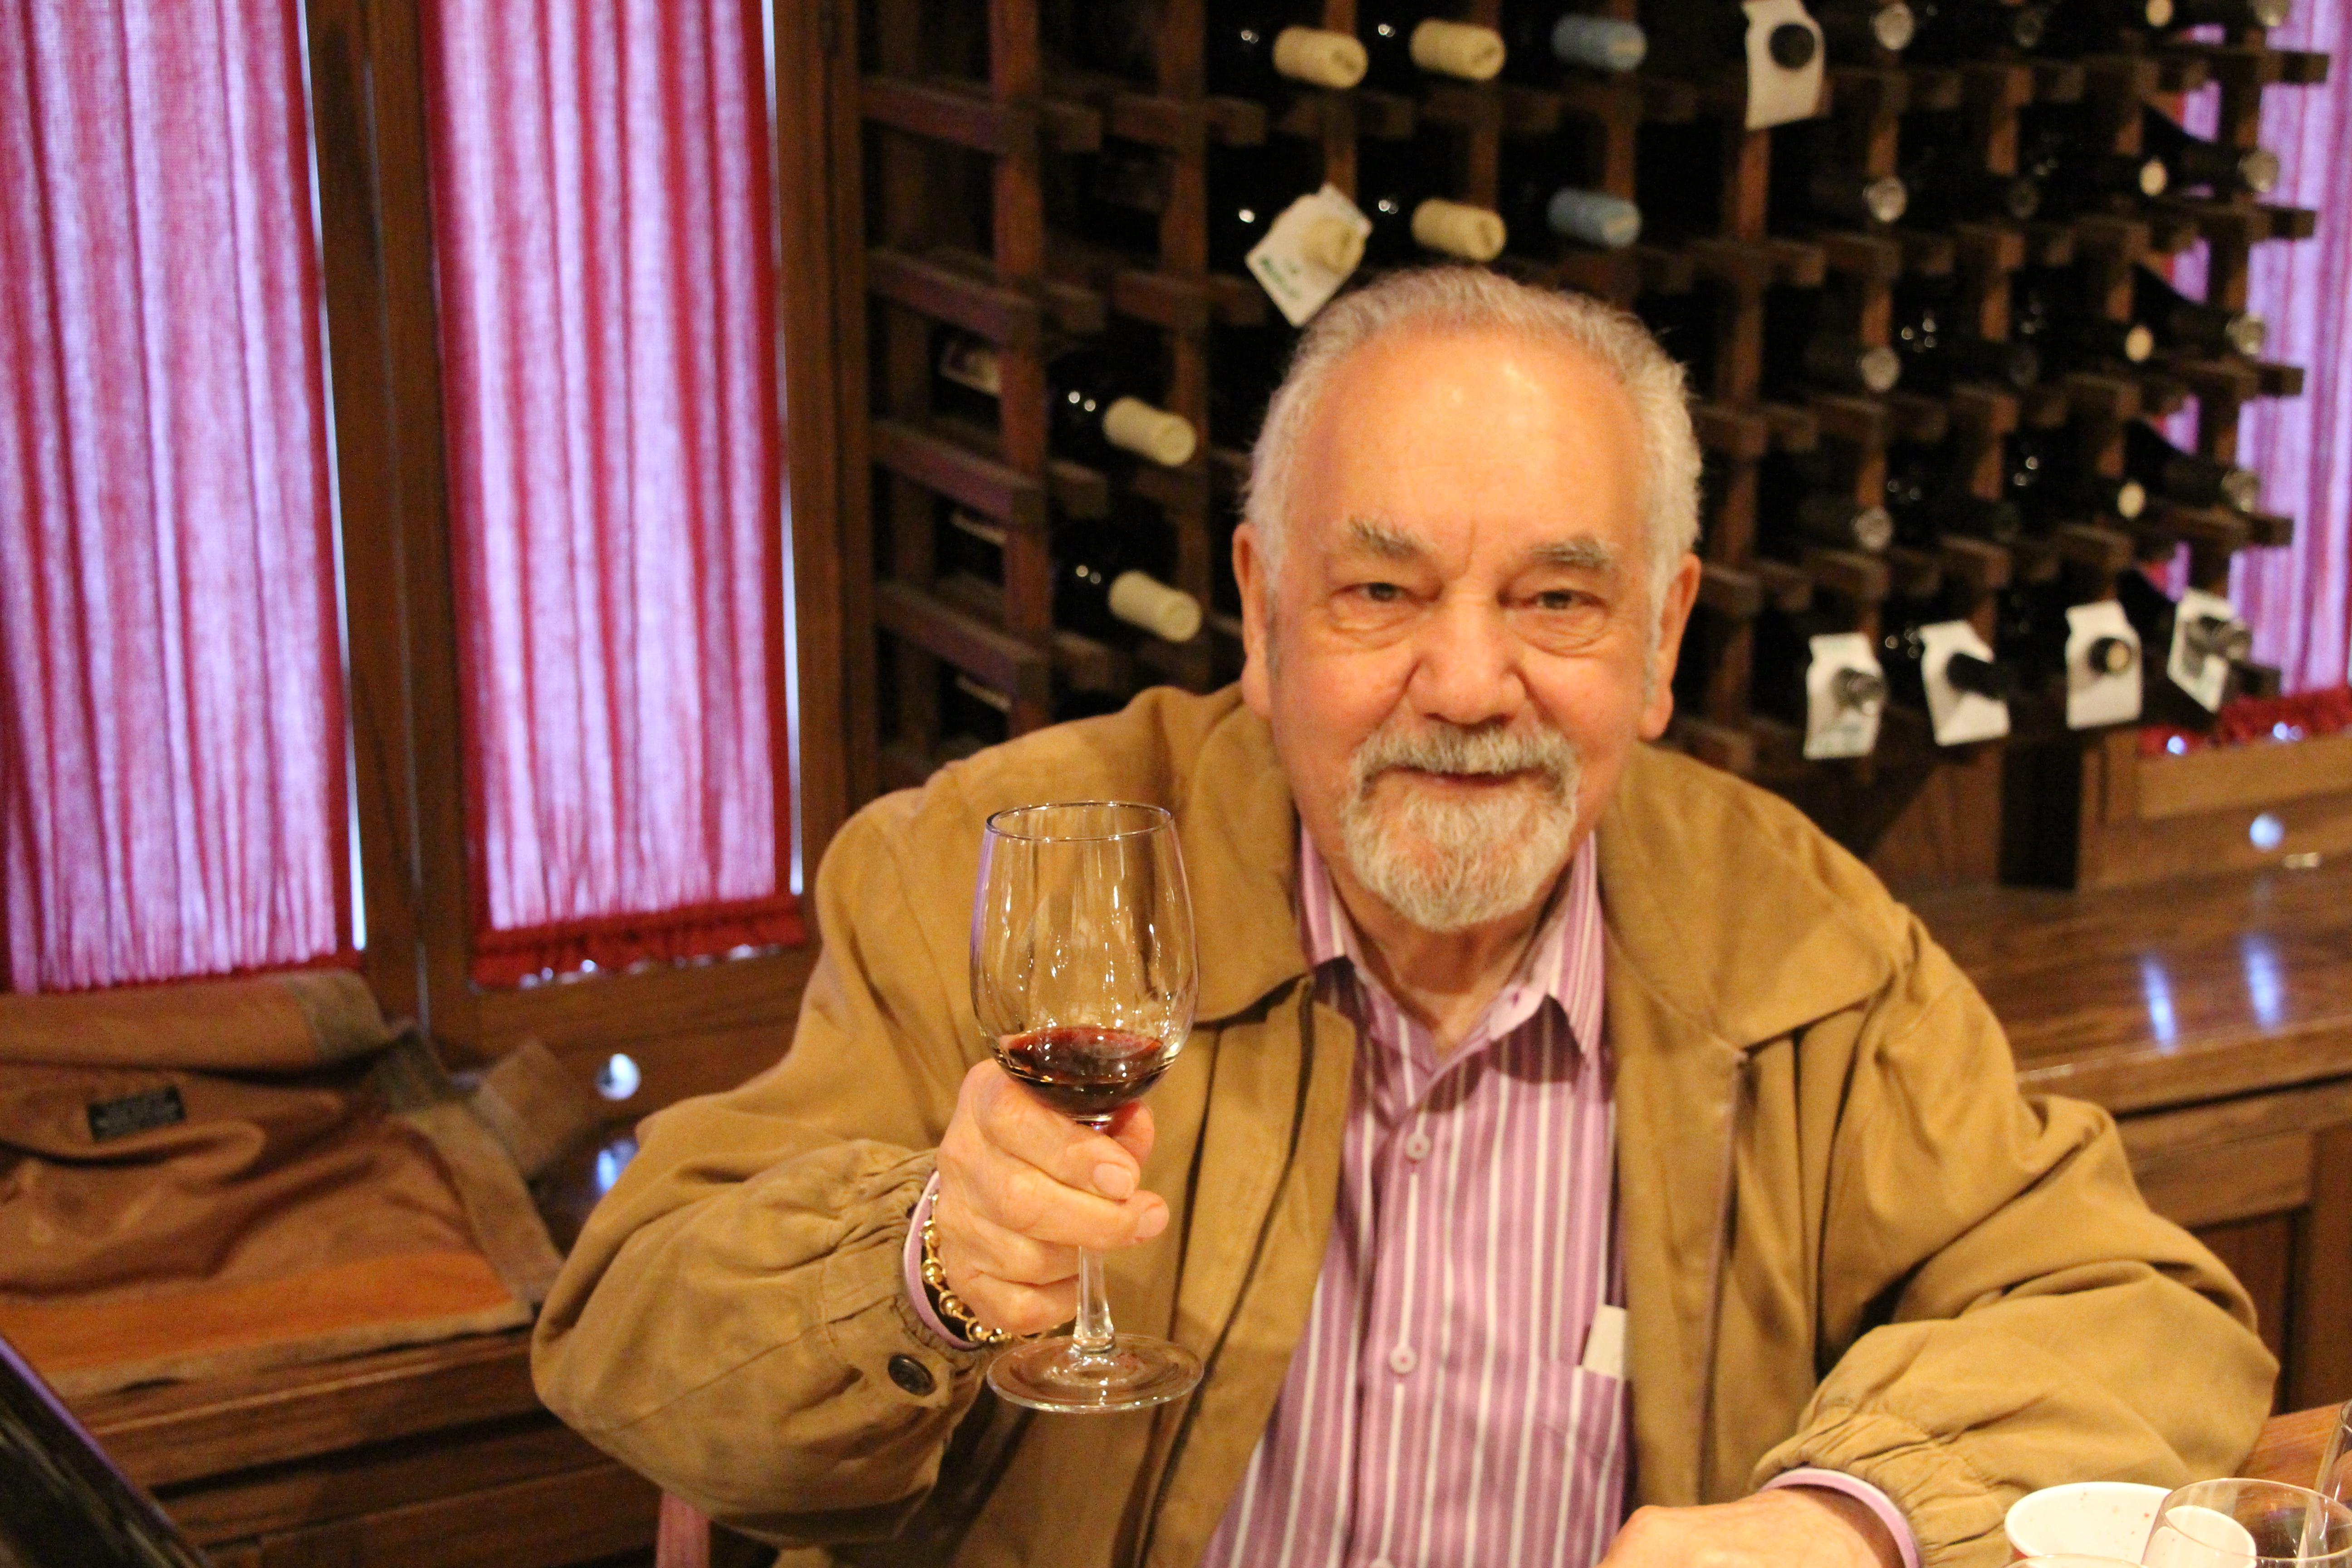 Caption: Wine expert Narsi David, Credit: Reese Erlich 2014 (c)